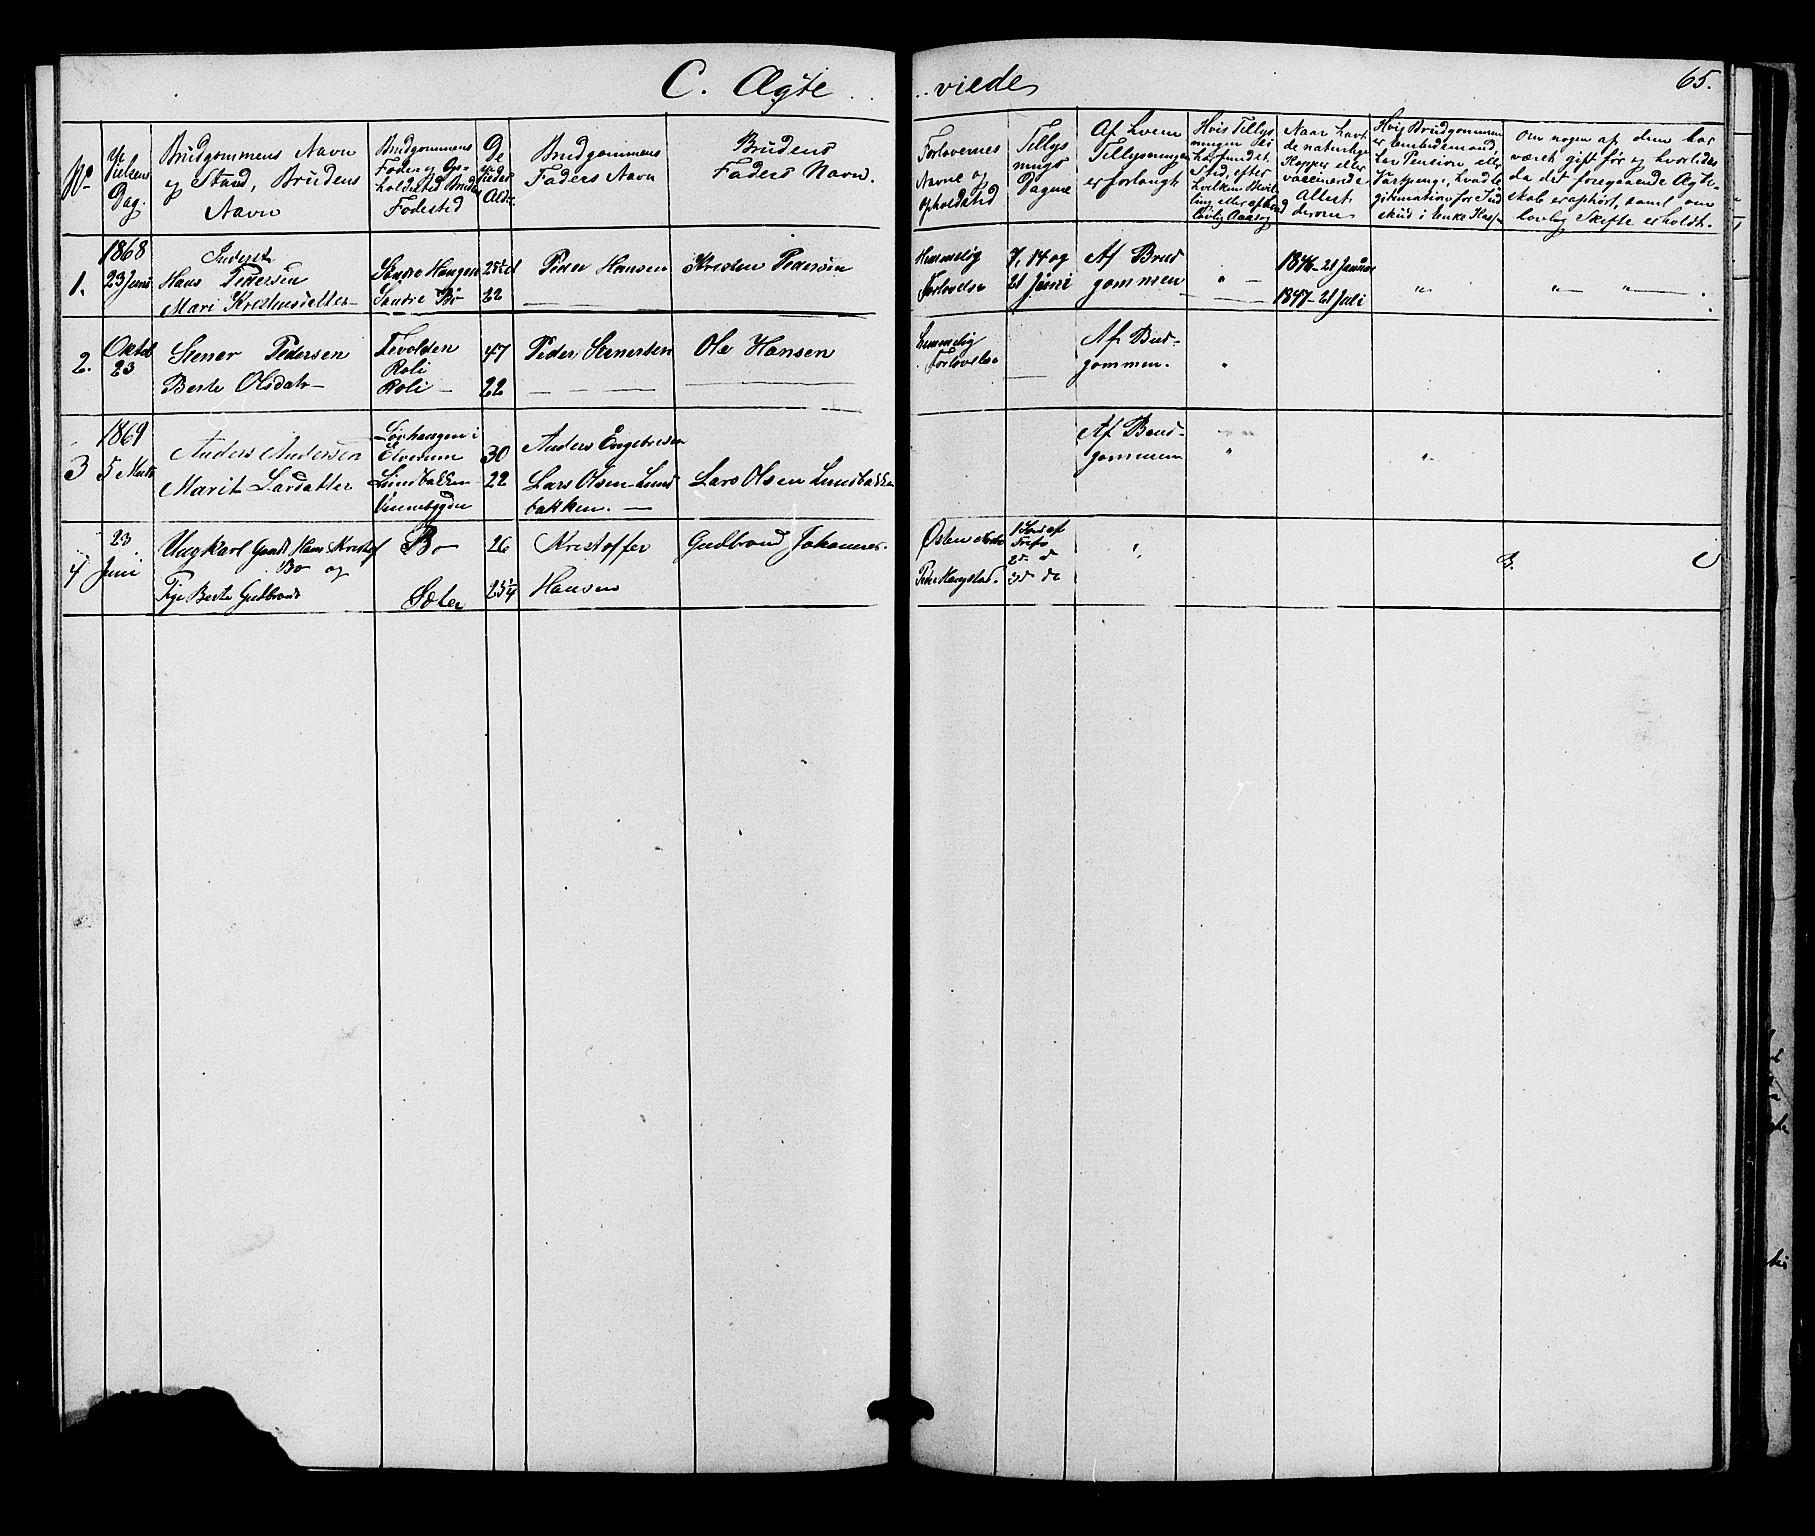 SAH, Ringebu prestekontor, Klokkerbok nr. 5, 1868-1870, s. 65